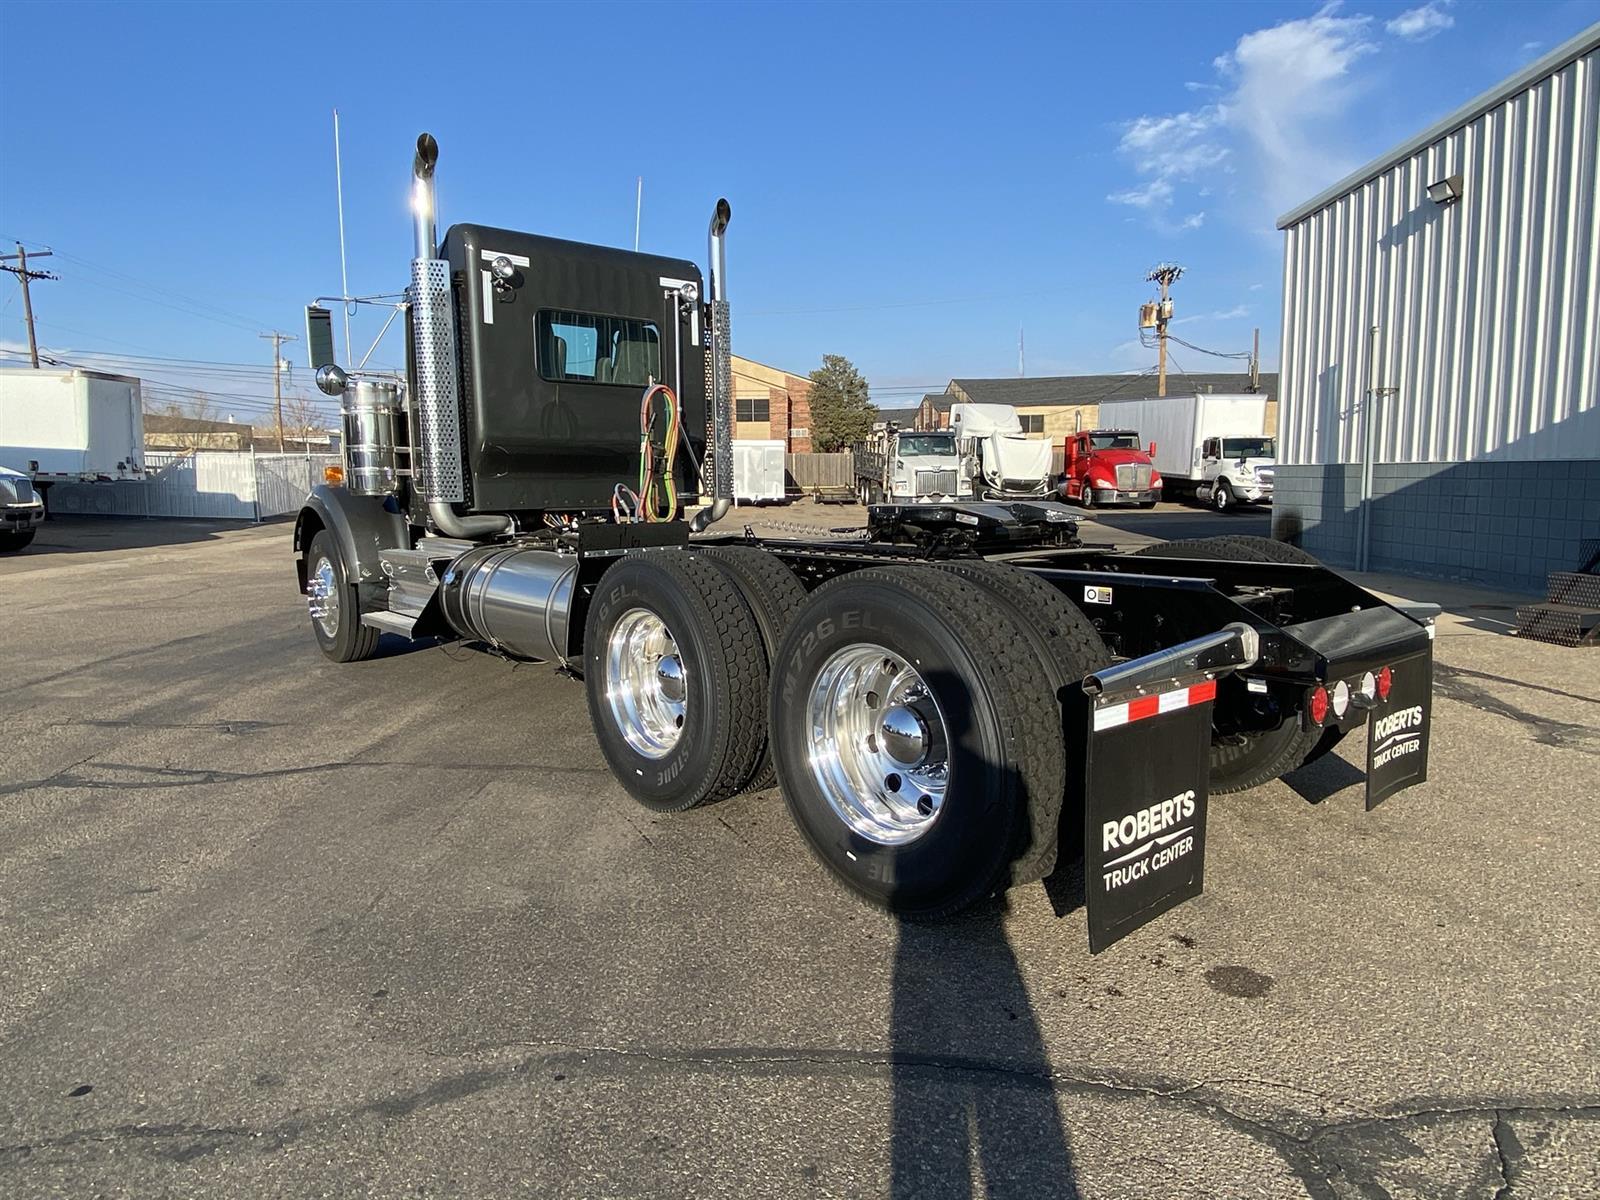 2021 Kenworth W900 6x4, Tractor #MR452024 - photo 1